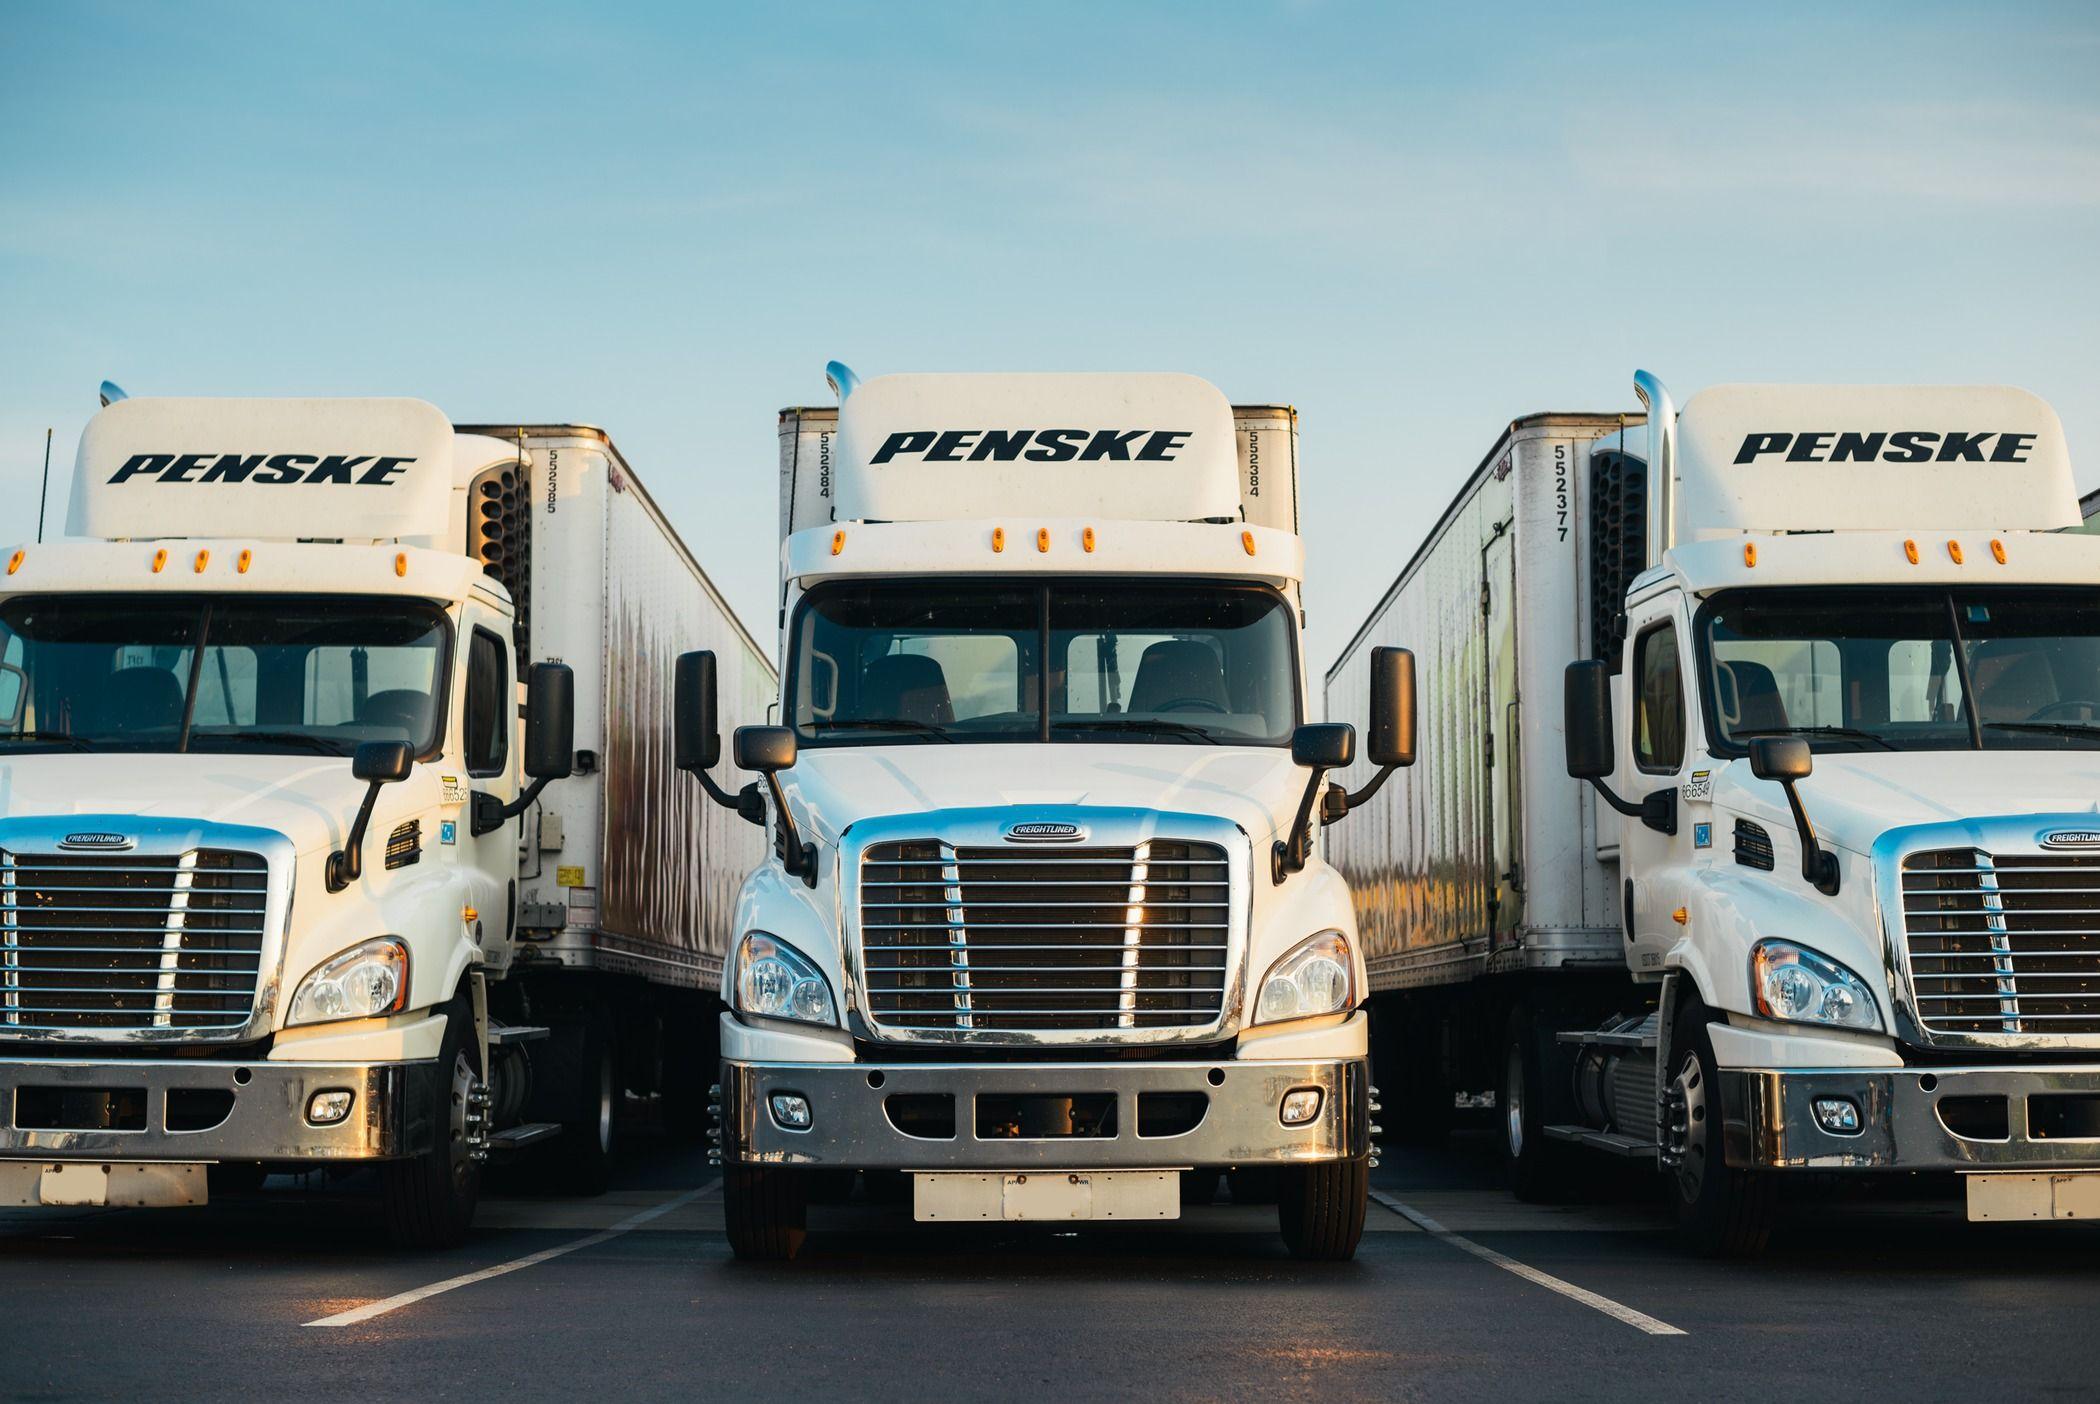 Penske Truck Leasing Showcasing at 2018 NAFA Institute & Expo